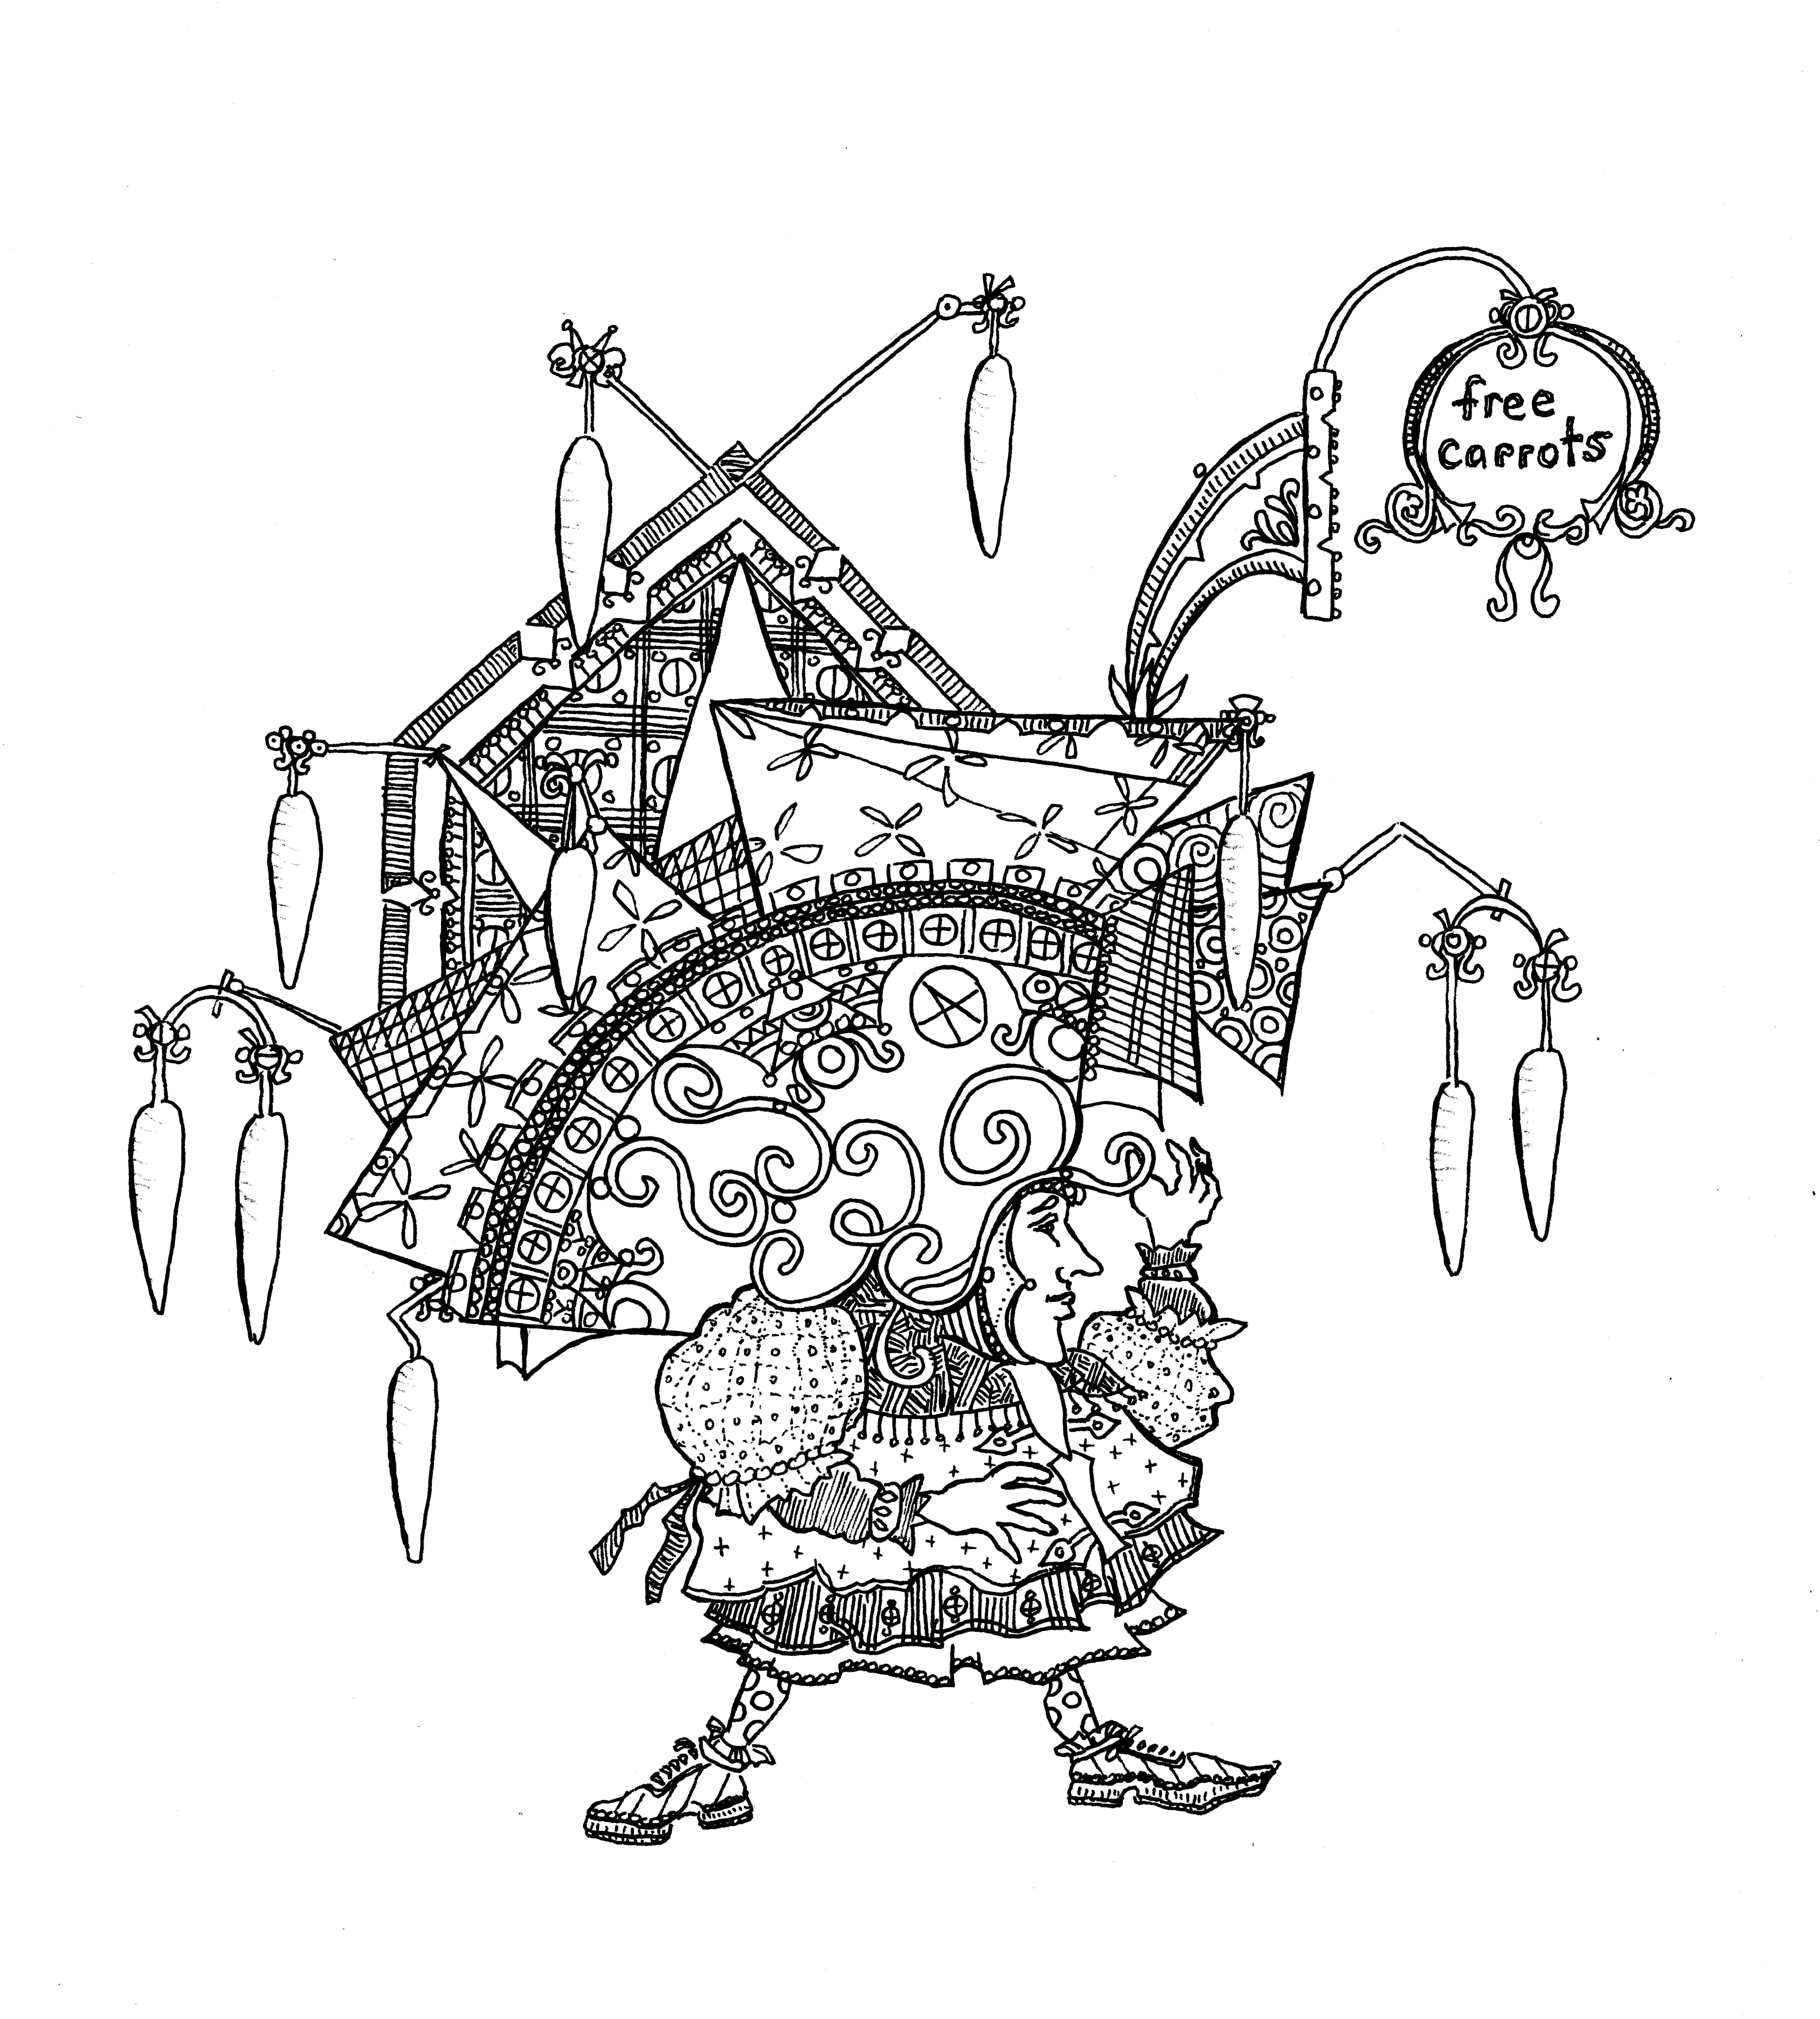 Little man wearing dangling-carrot hat - coloring sheet